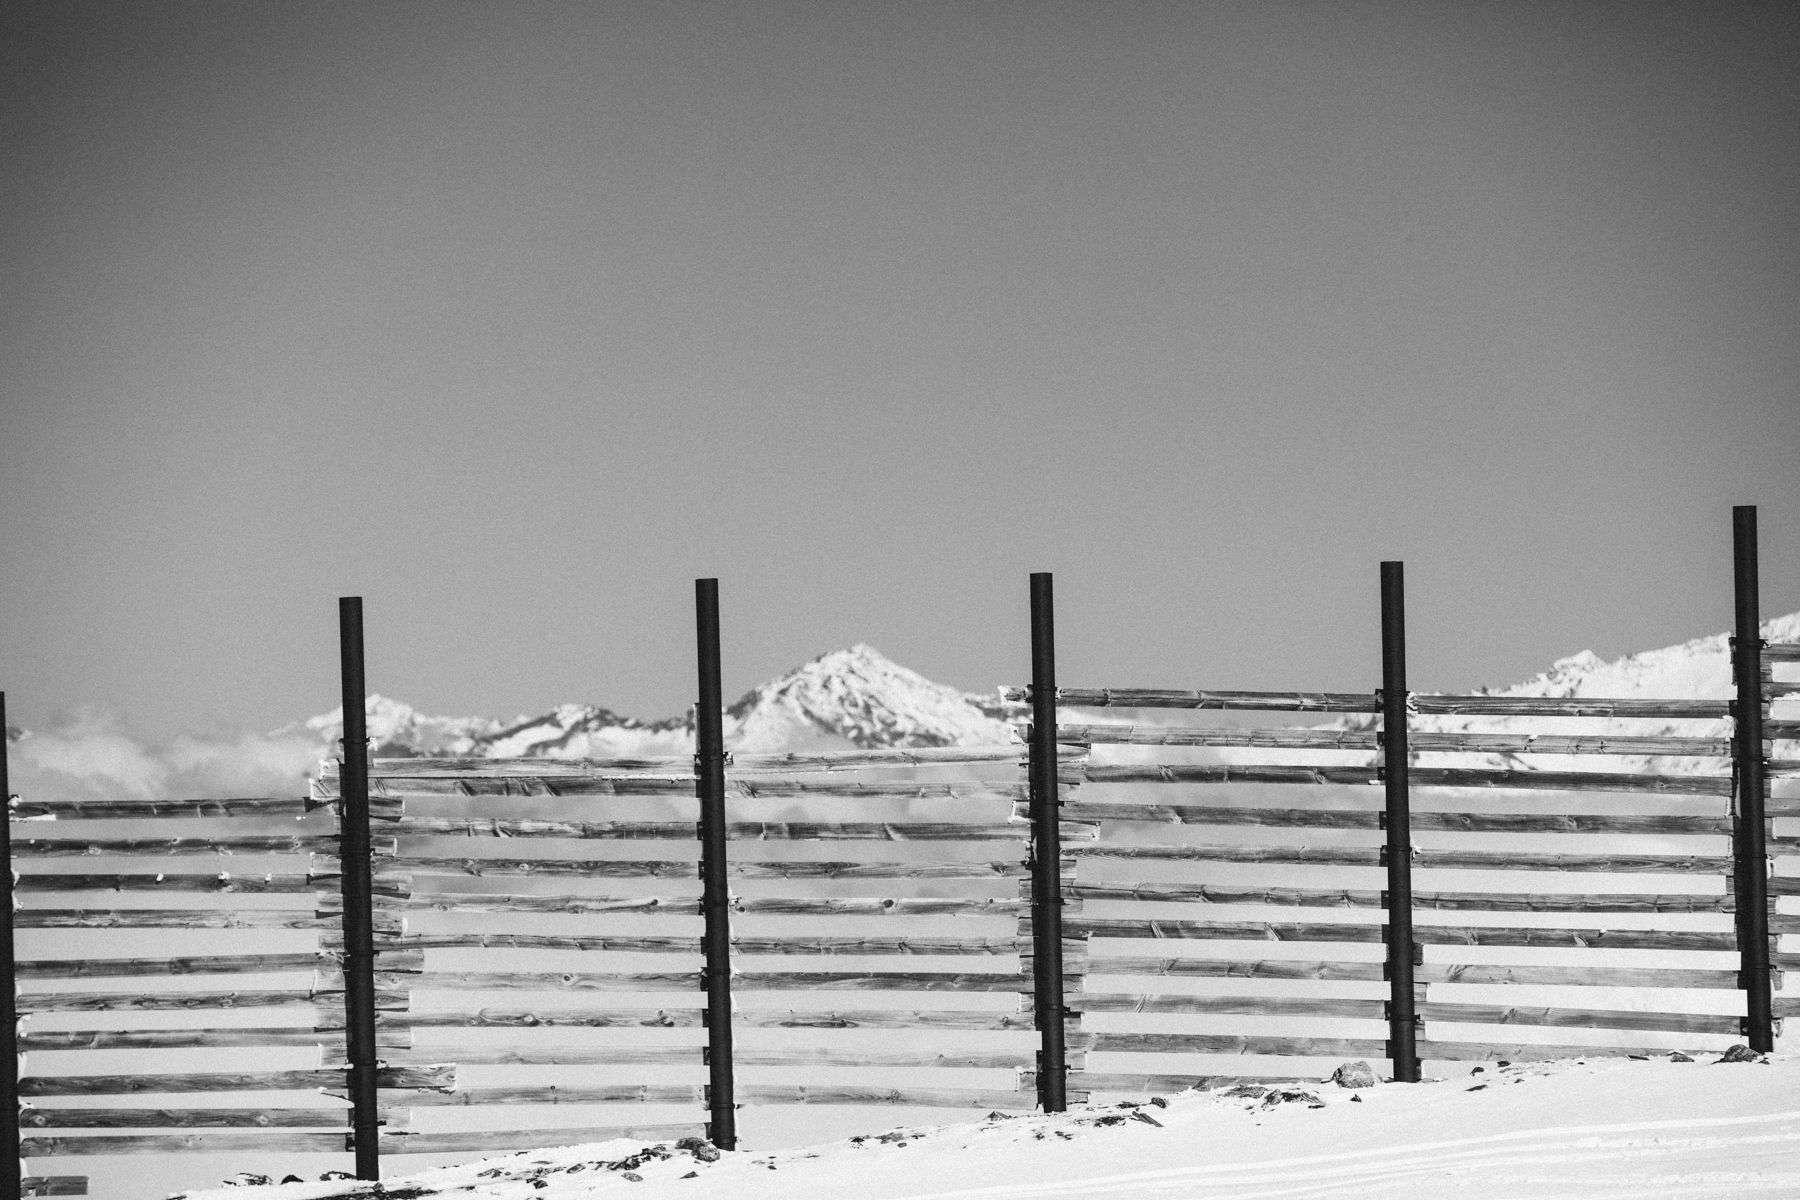 Cardrona Fence